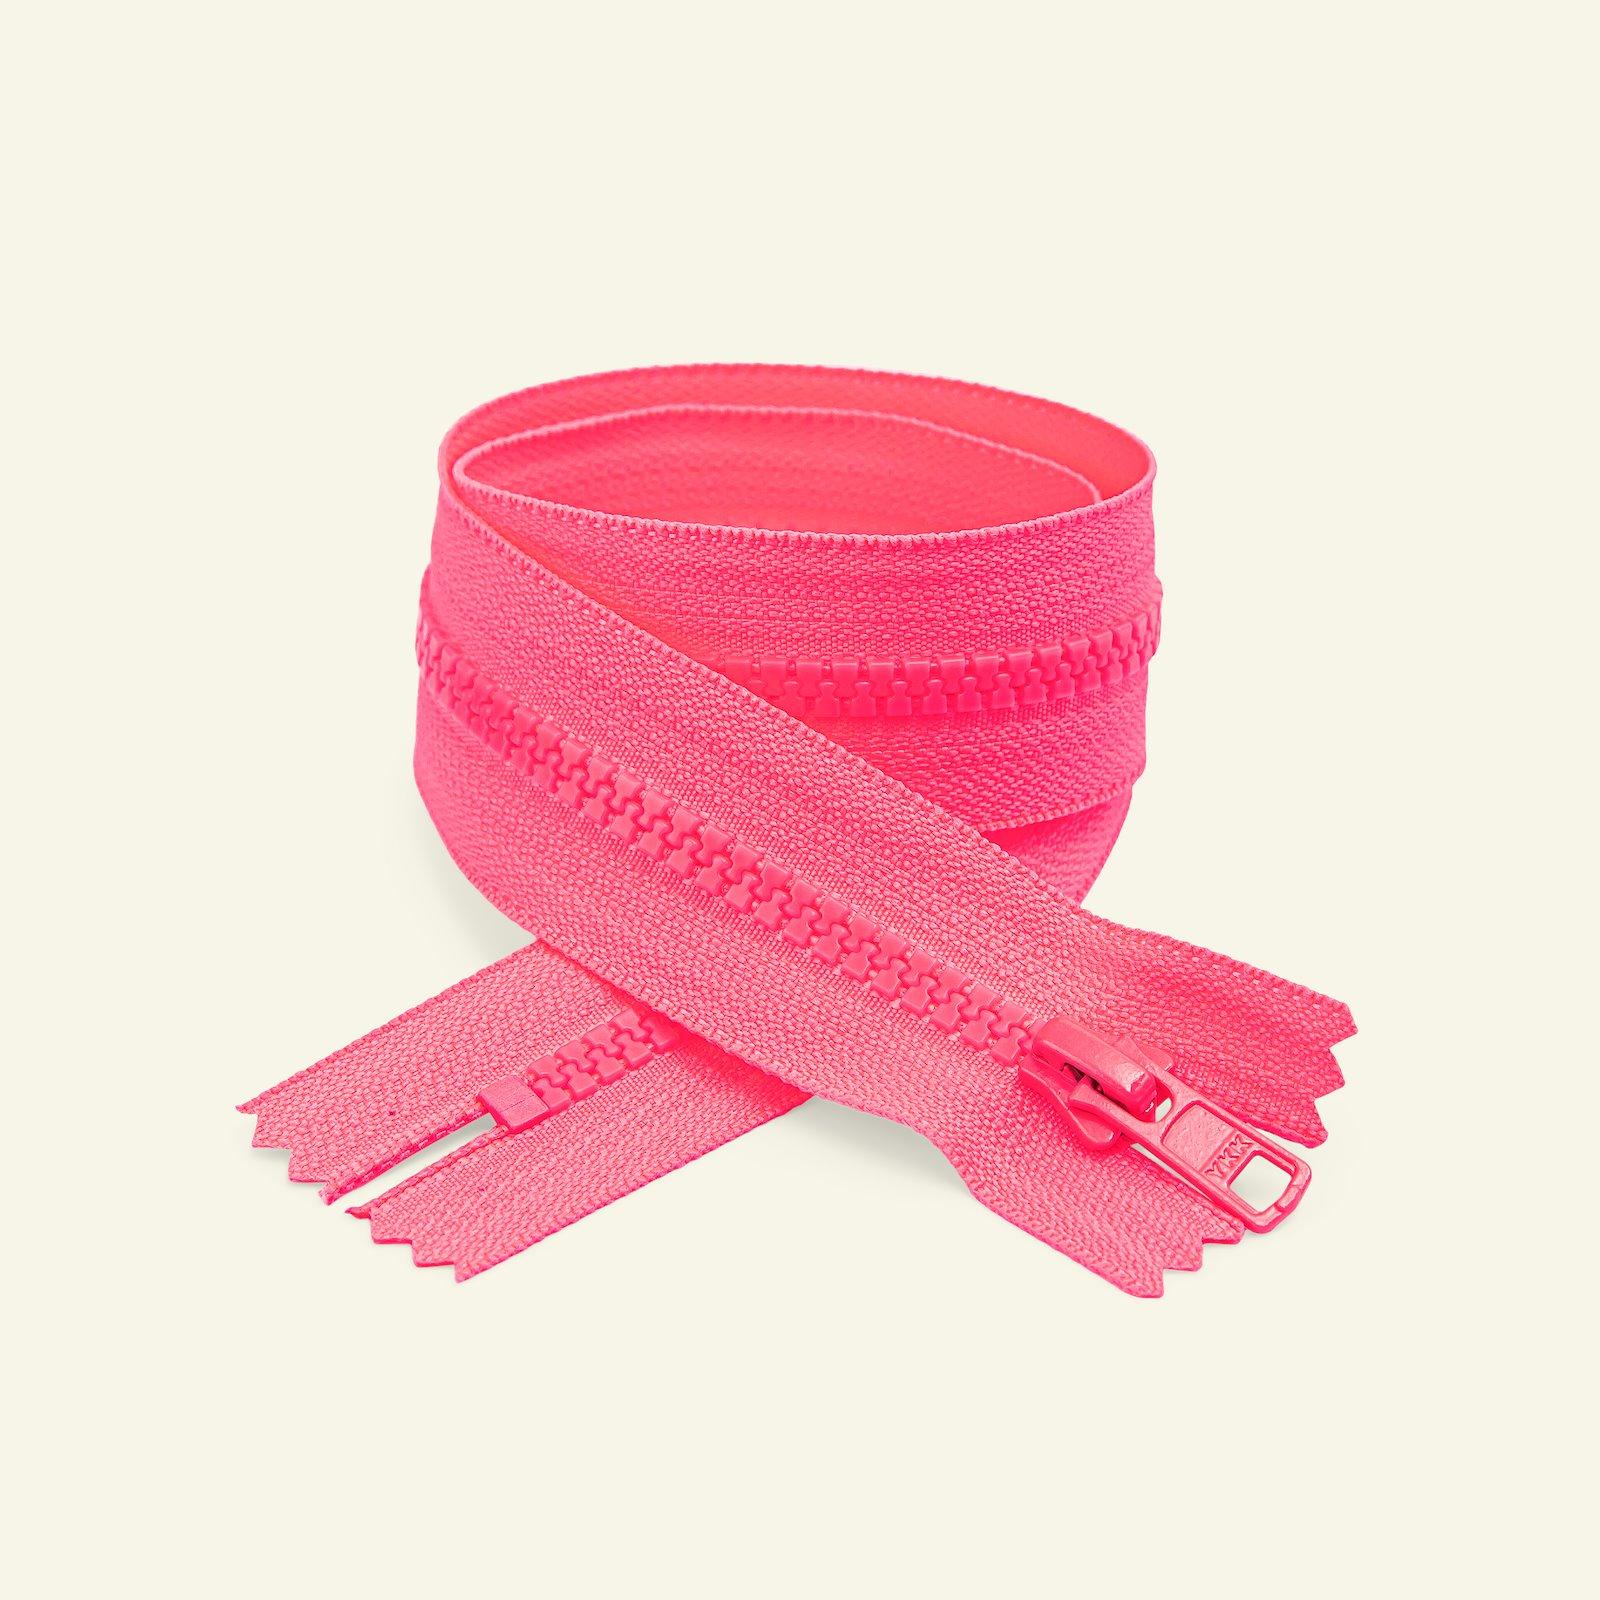 YKK zip 6mm closed end 20cm neon pink x50184_pack